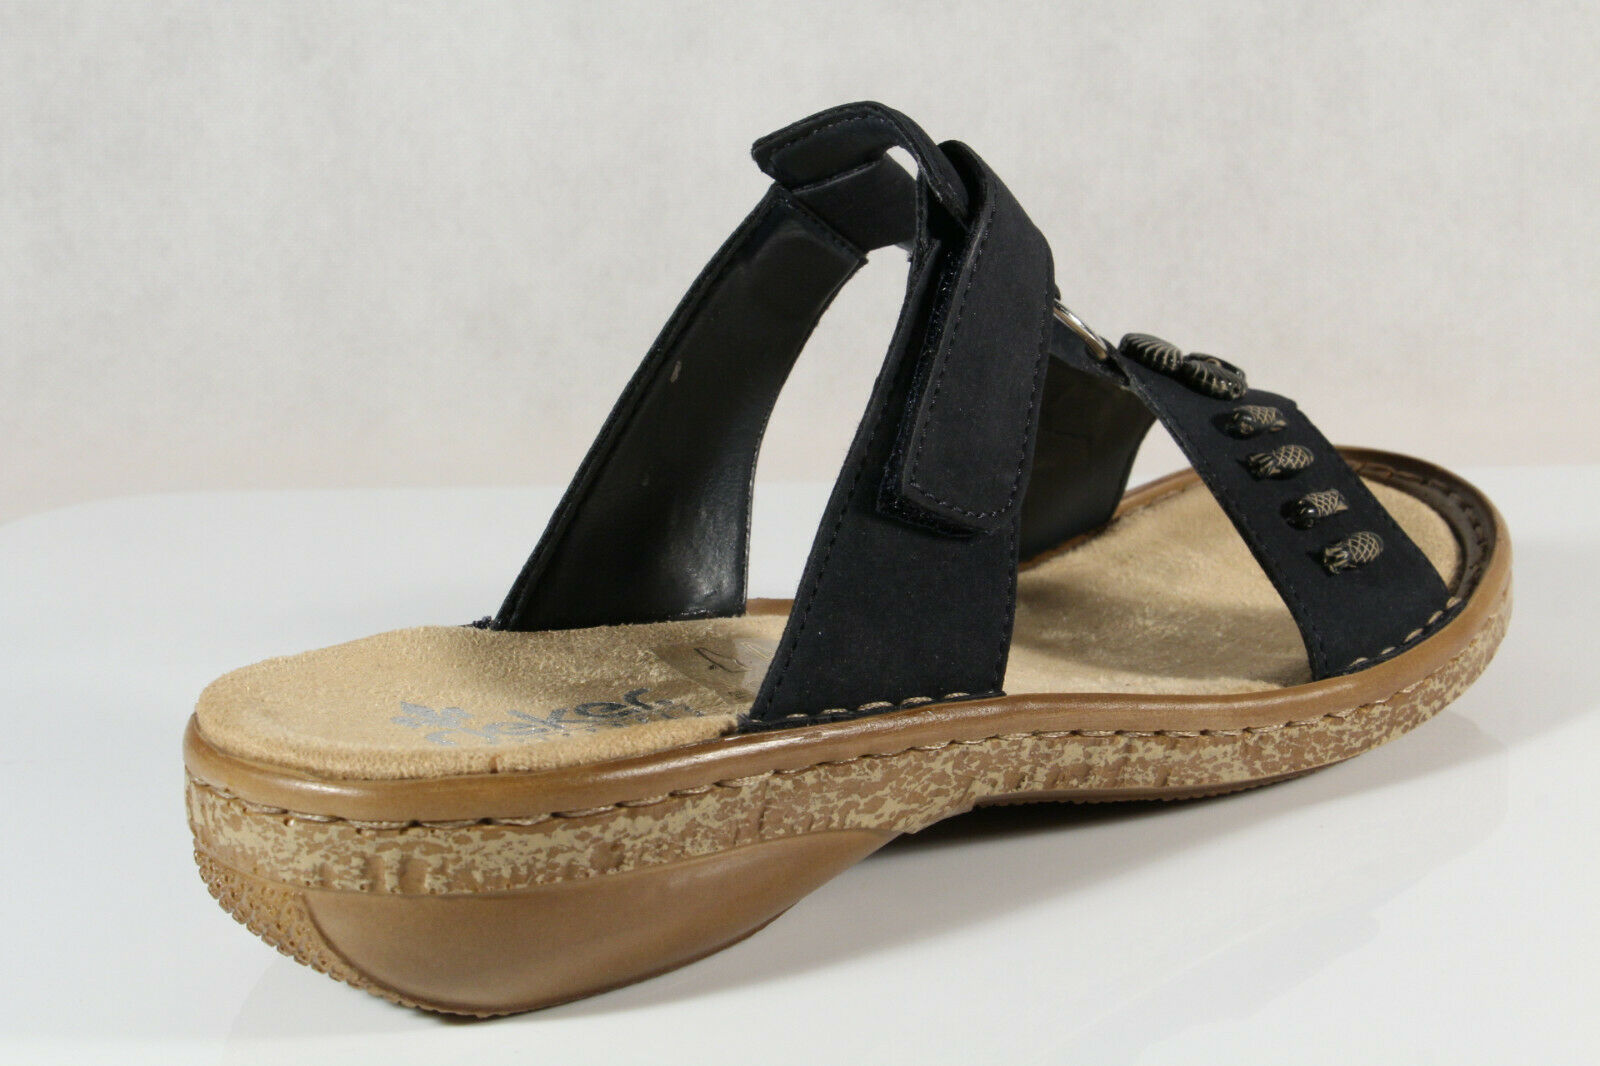 Rieker Damen Pantolette Pantoletten Pantoffel Hausschuhe